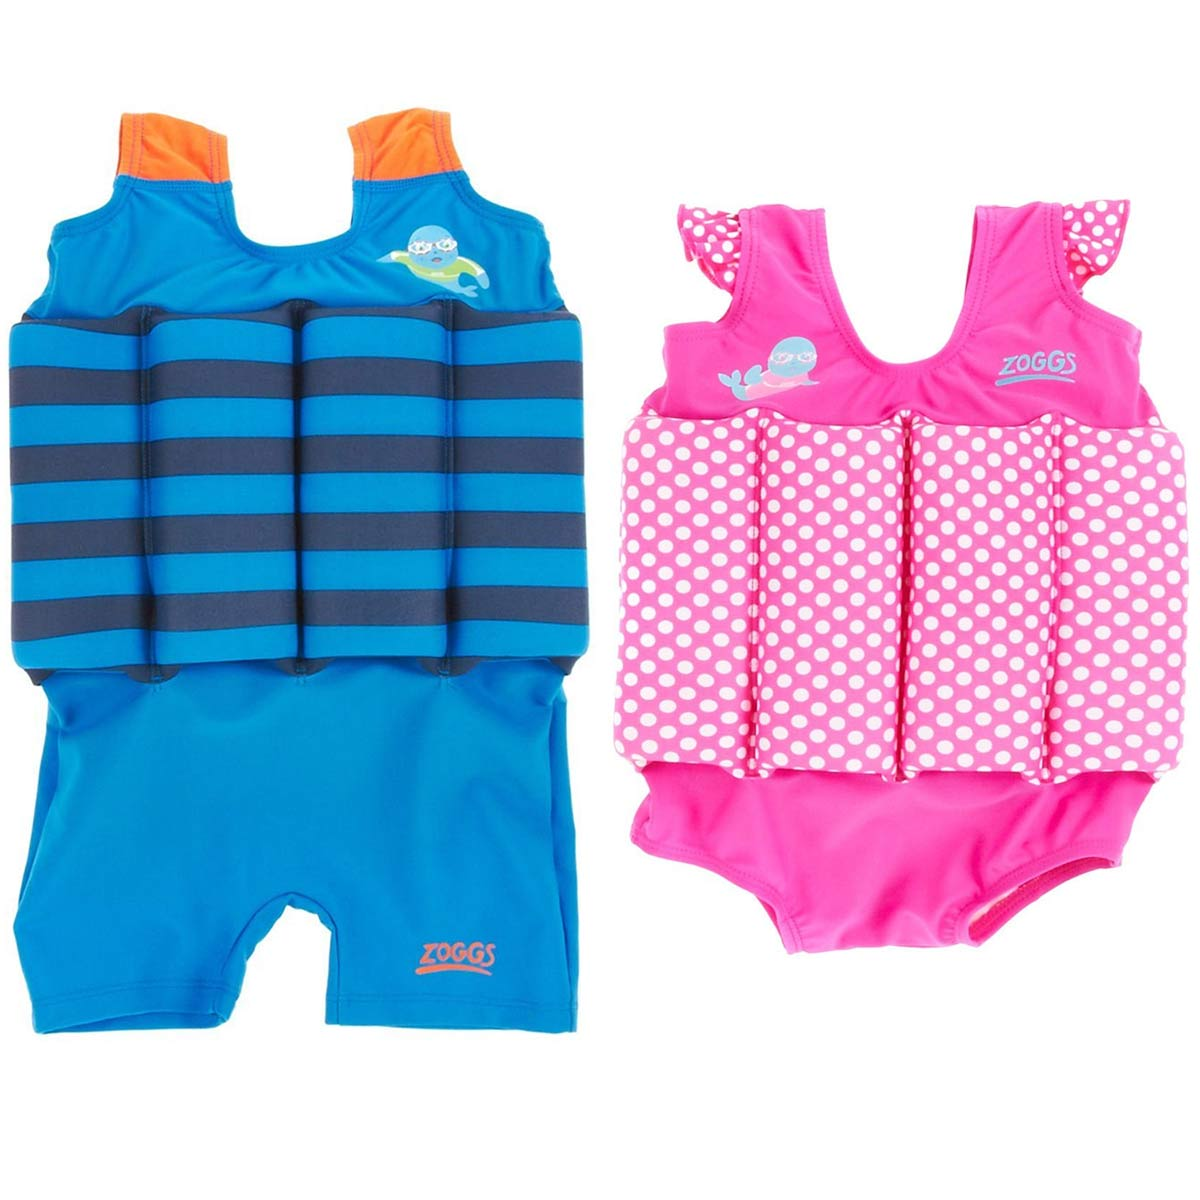 5acf95341a8a3 Baby Swim: Zoggs Baby Swim Suit